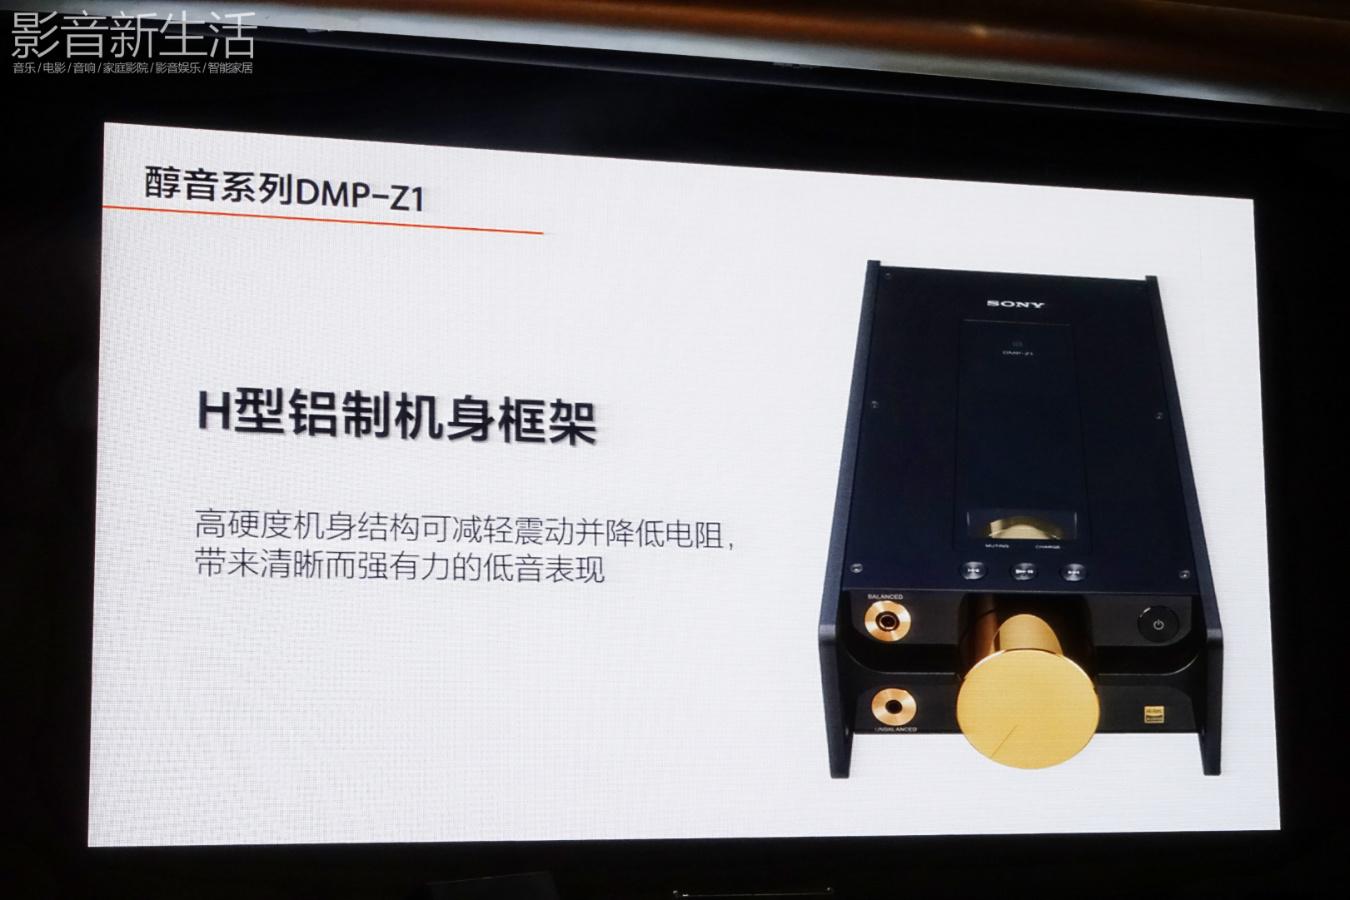 "Sony Hi Res 2018 39 - 新品 | ""重塑随身音乐娱乐王朝!"":Sony索尼发布Signature醇音系列新兄弟IER-Z1R和DMP-Z1,以及舞台监听耳机系列:IER-M7和IER-M9,还有升级款MDR-Z7M2!"